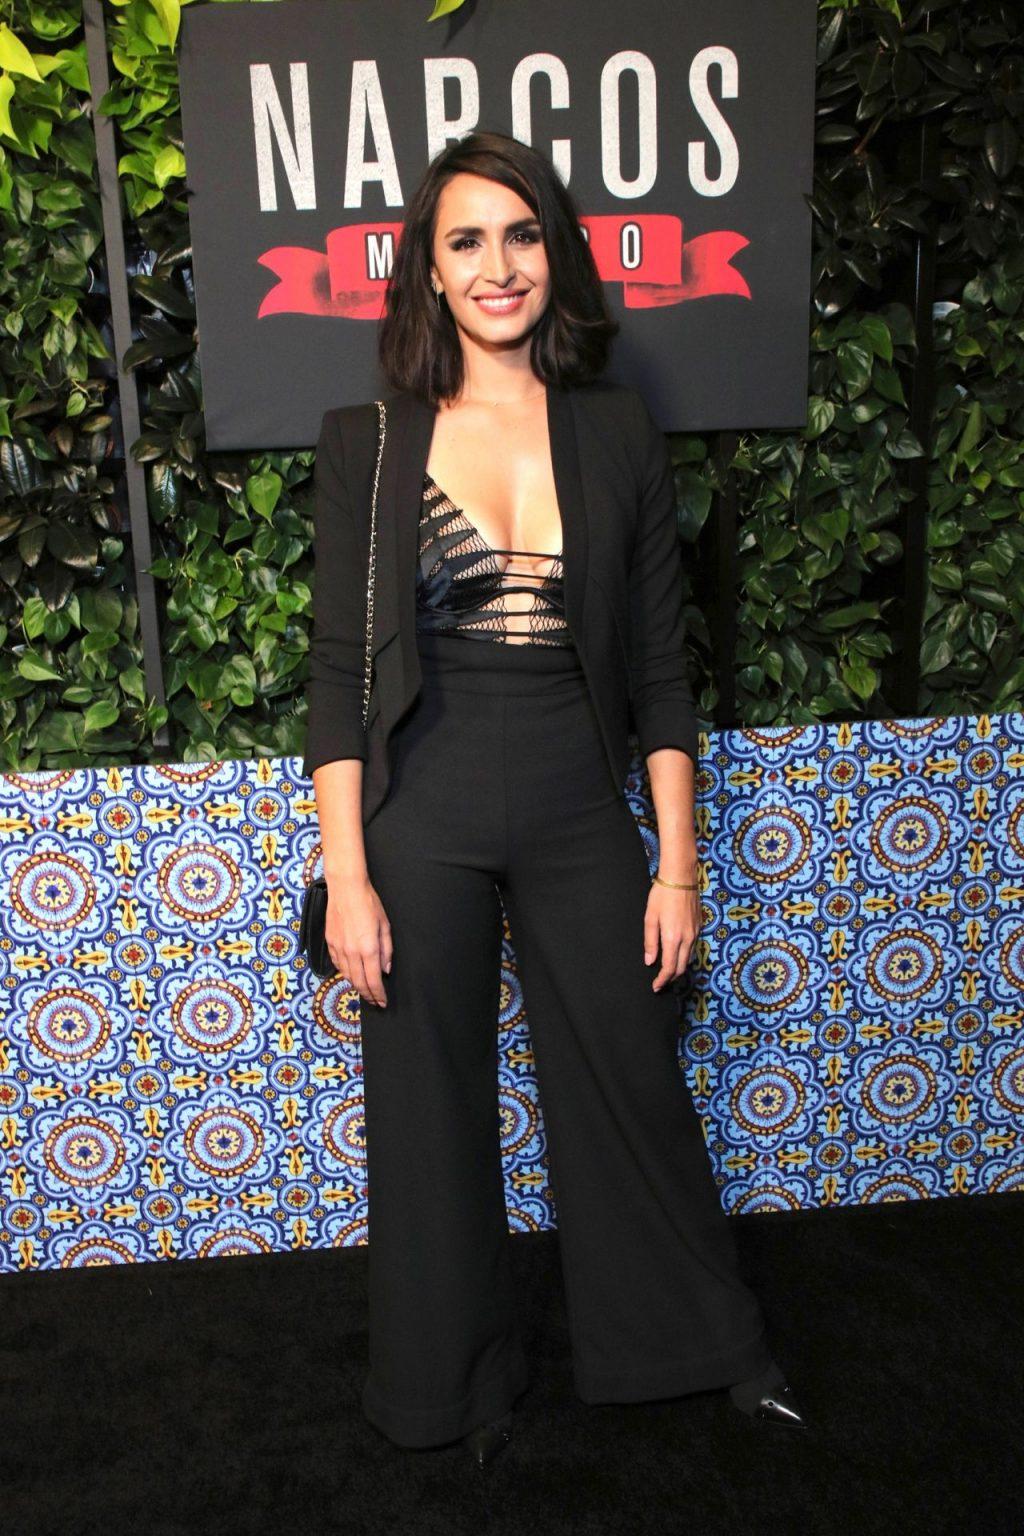 Fernanda Urrejola's Tits at the Narcos Season 2 Premiere (46 Photos)